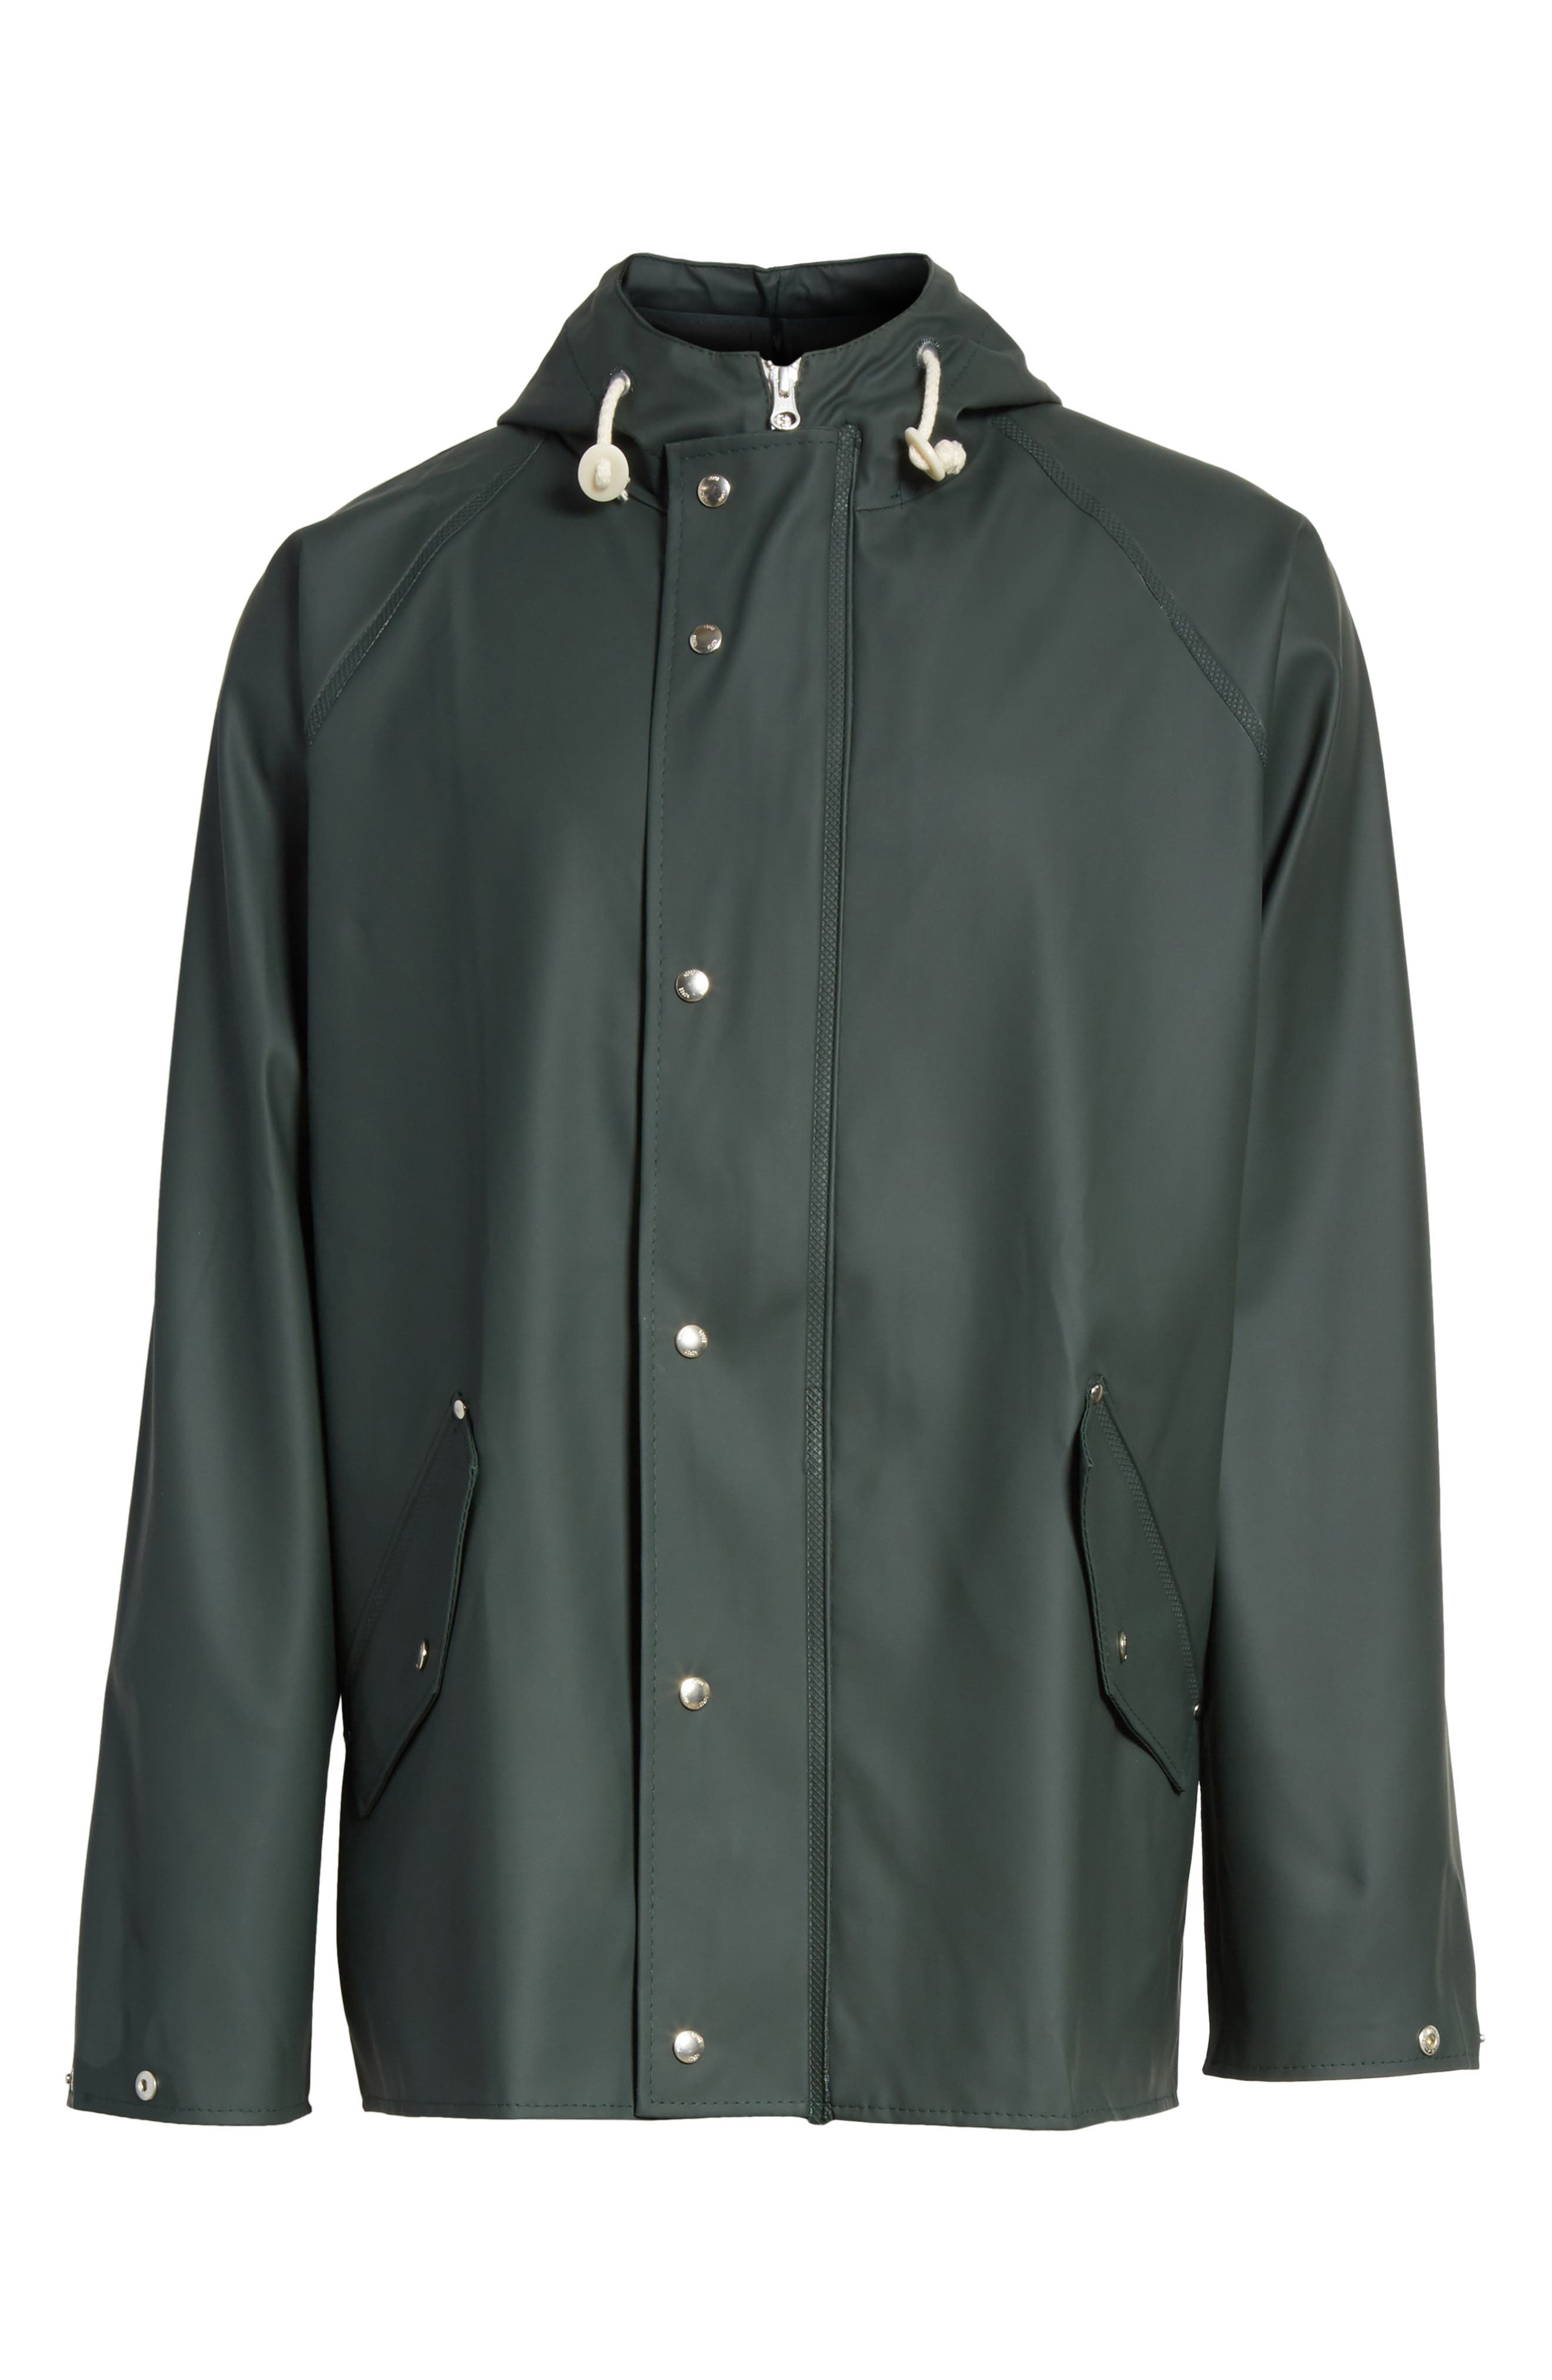 Waterproof Rain Jacket,                             Alternate thumbnail 10, color,                             Moss